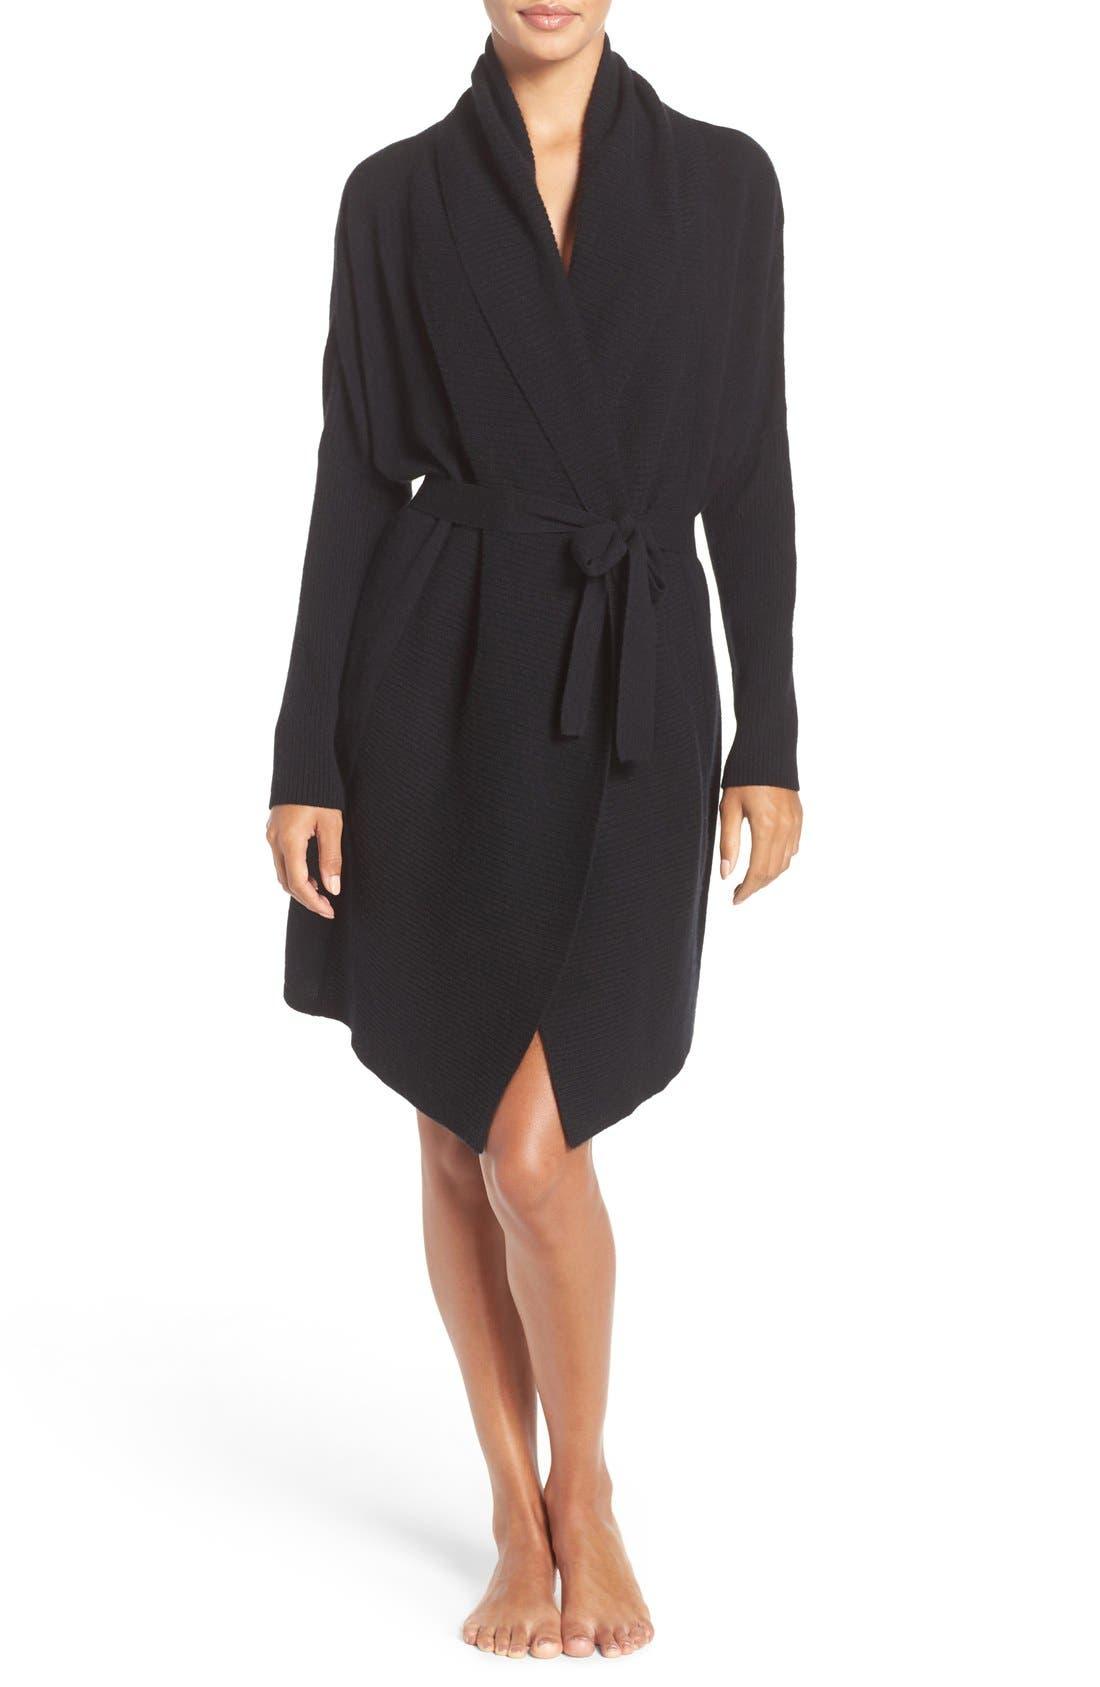 UGG 'Cheyenne' Cashmere Robe,                             Main thumbnail 1, color,                             Black